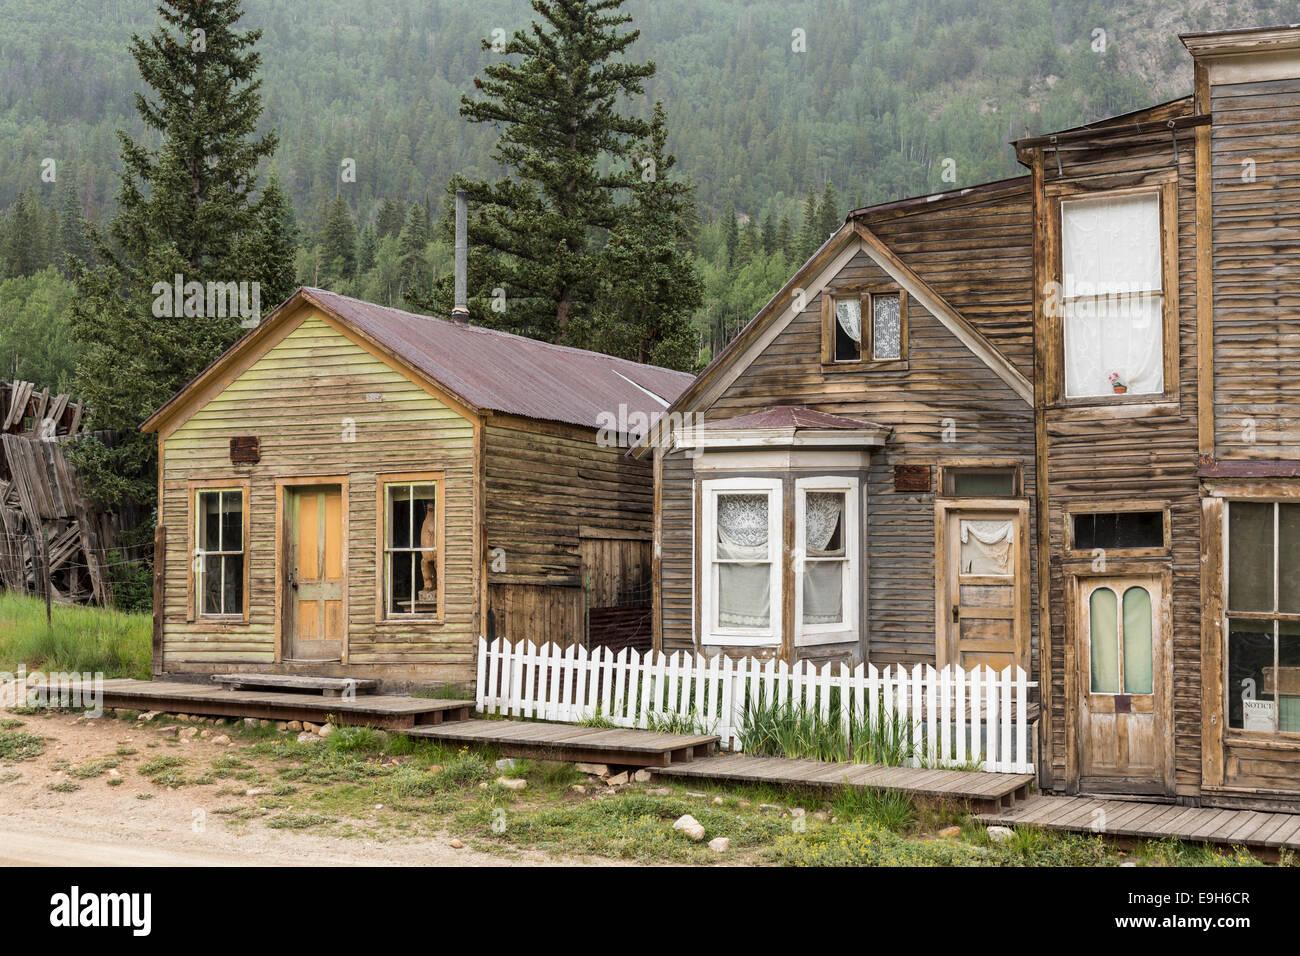 Ghost town of St Elmo, Colorado, USA - Stock Image